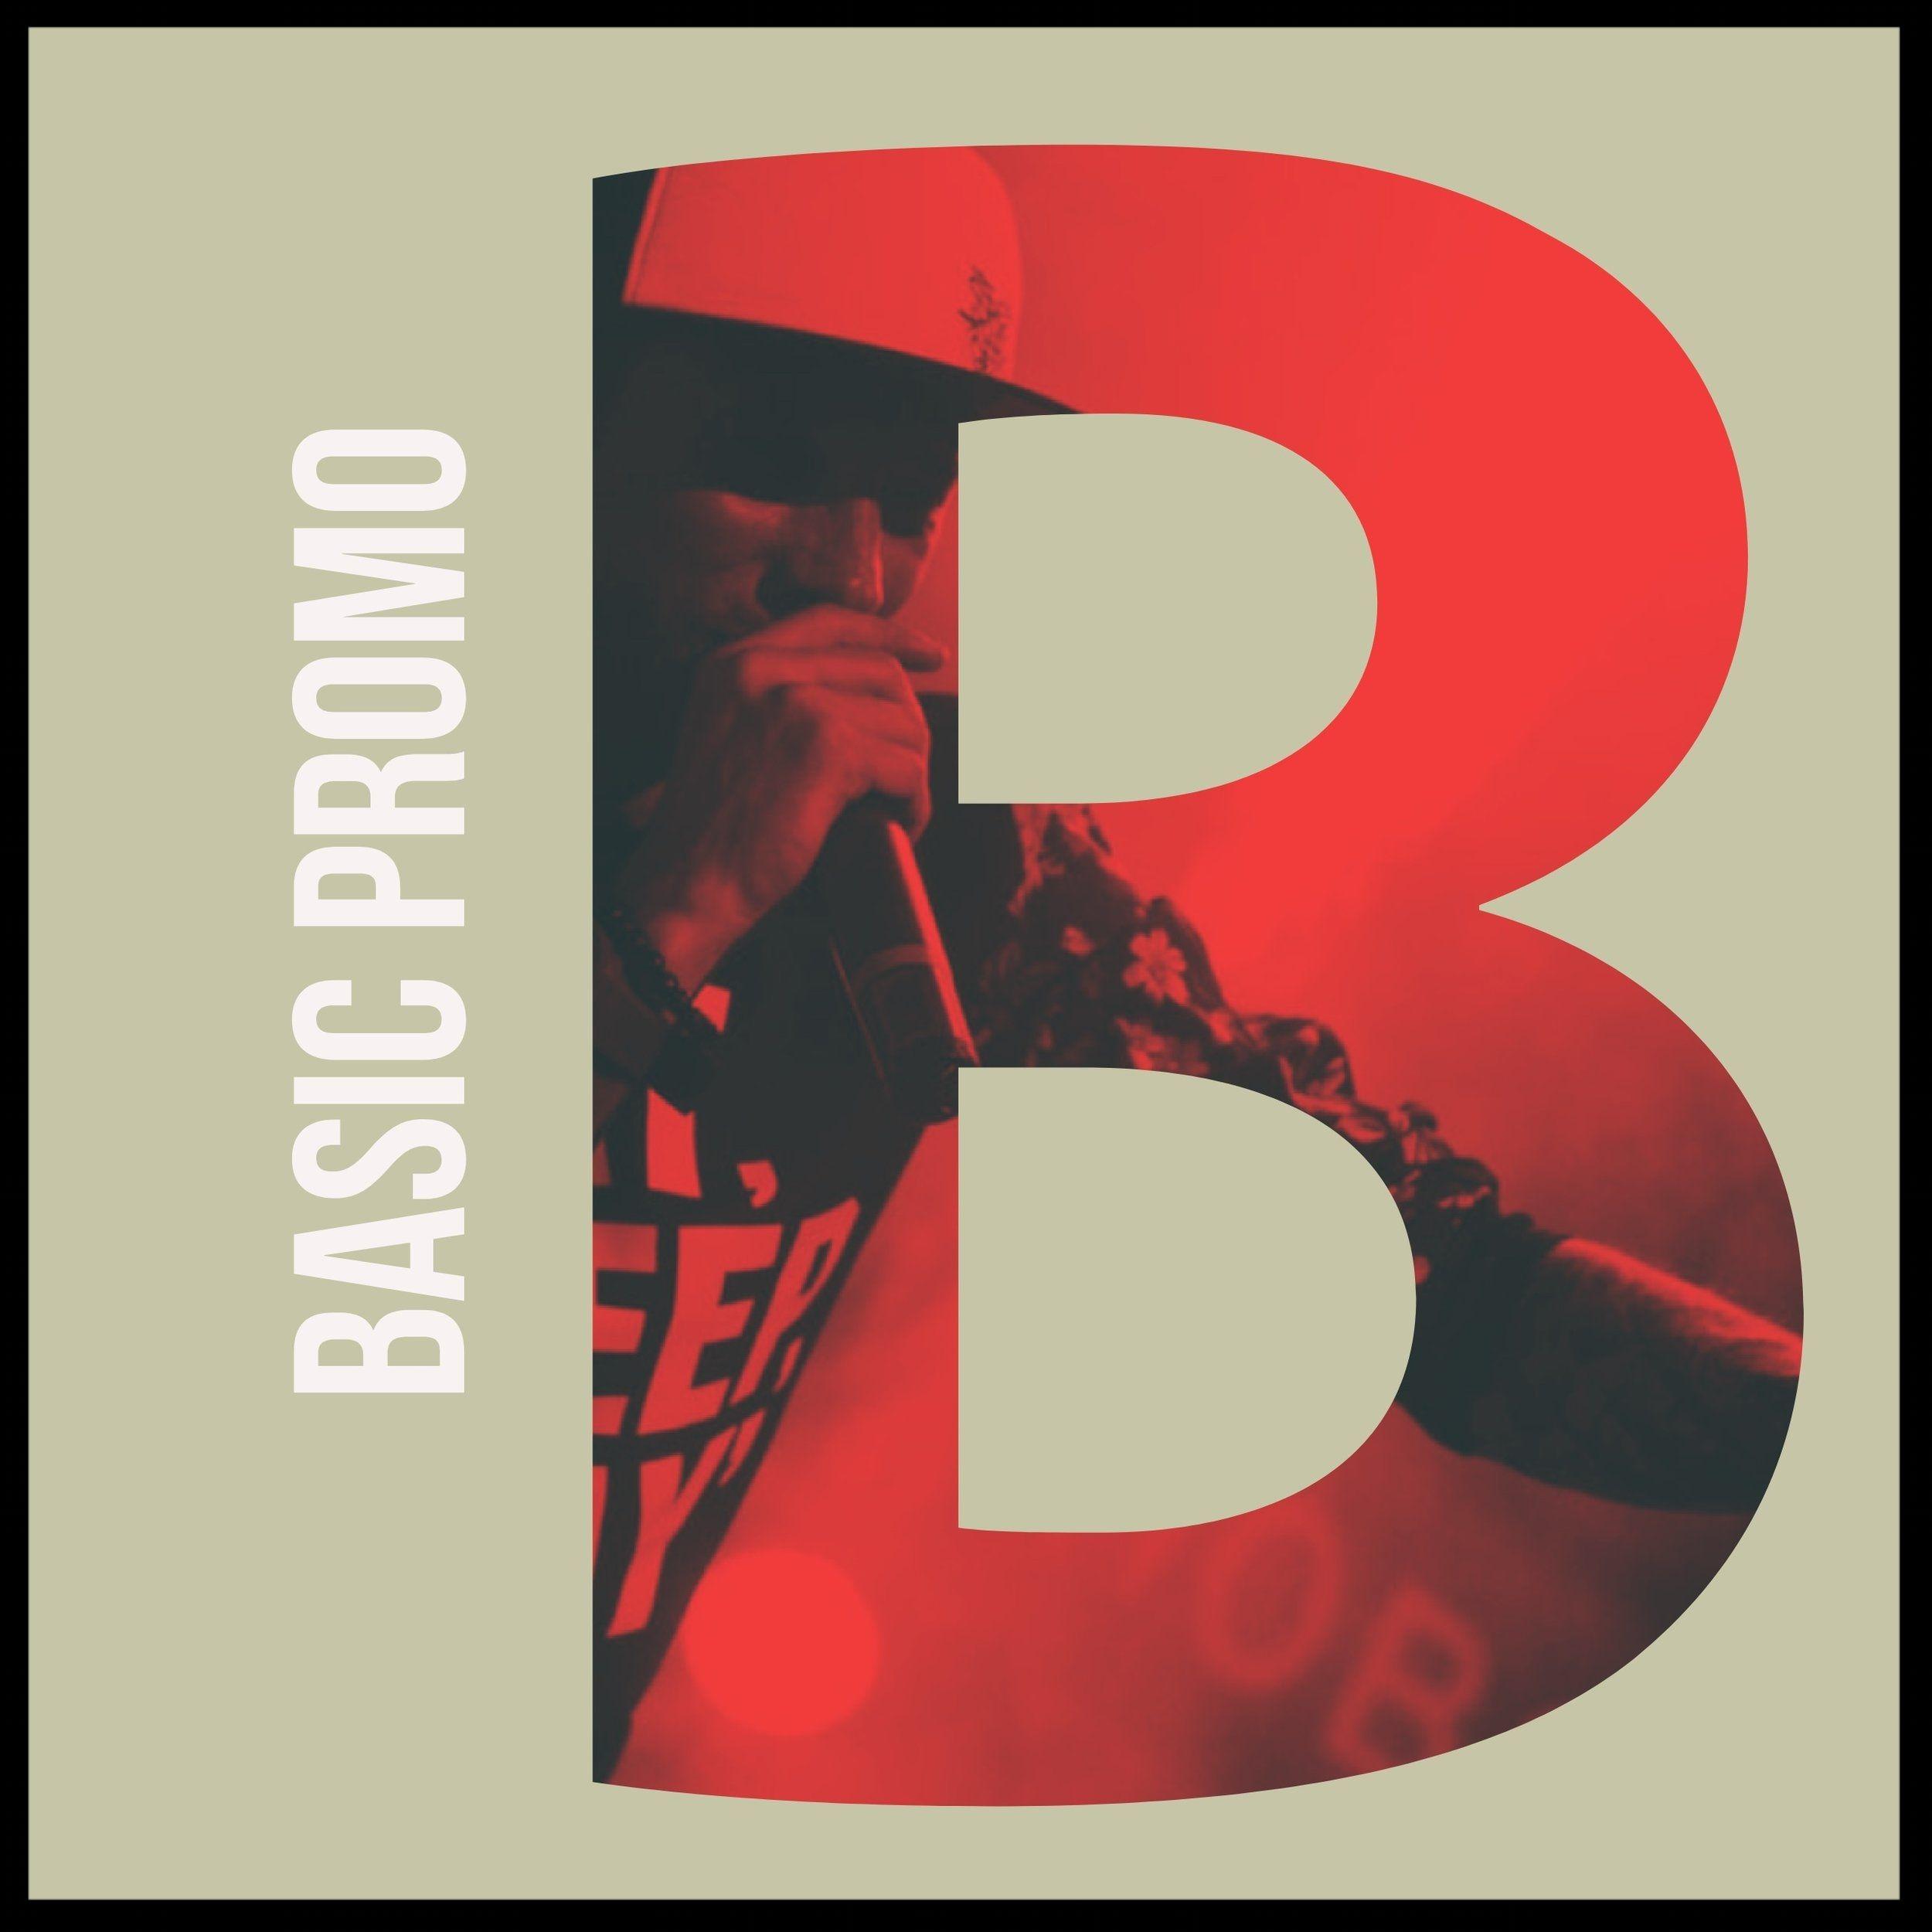 Basic Song Promo Jpg Music Promotion Soundcloud Songs Music Blog